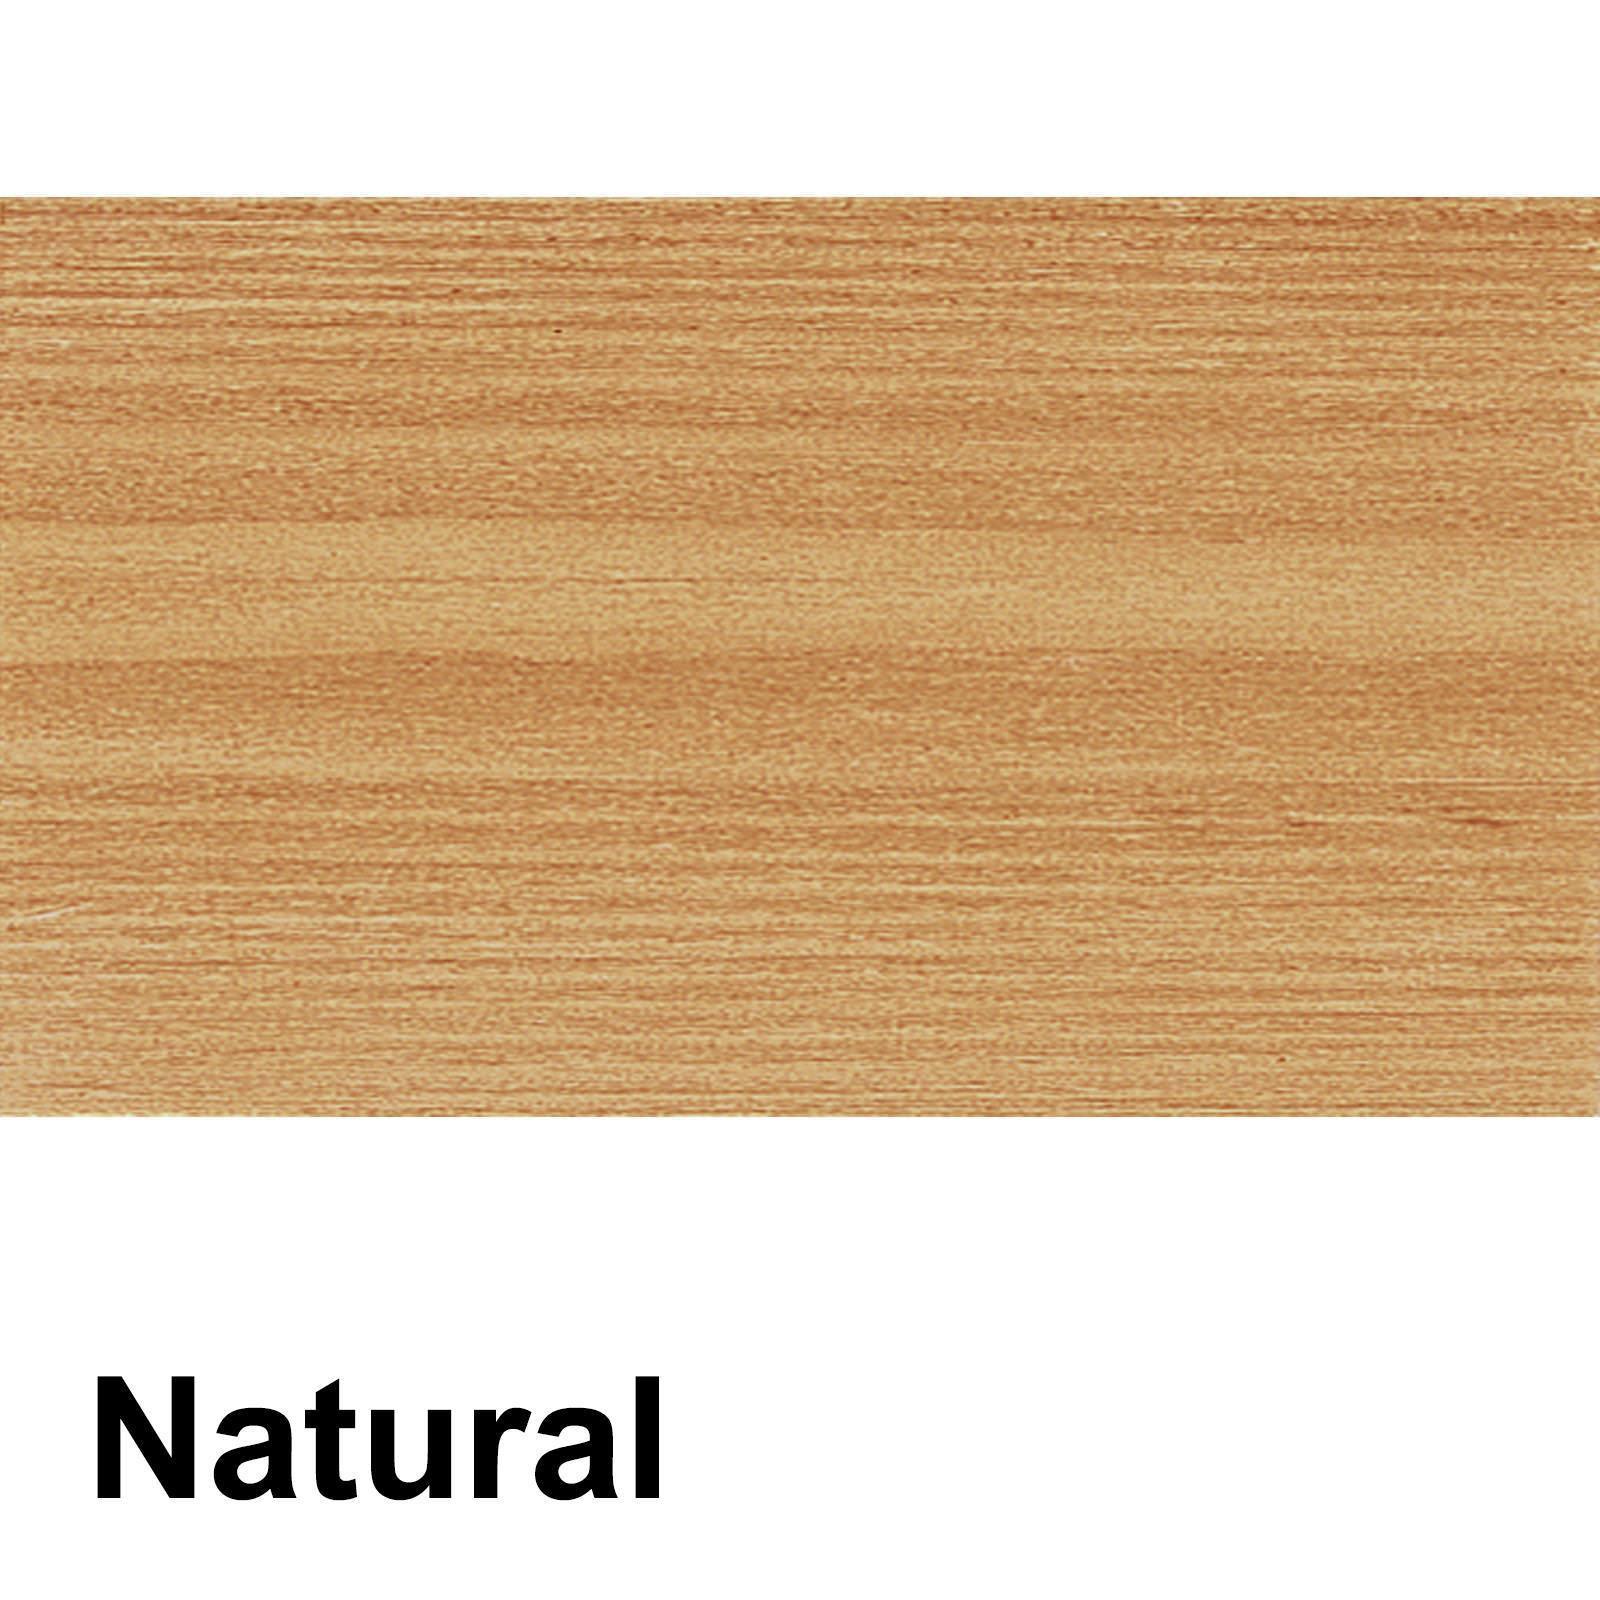 Ronseal 1l Hardwood Garden Furniture Oil Ultimate